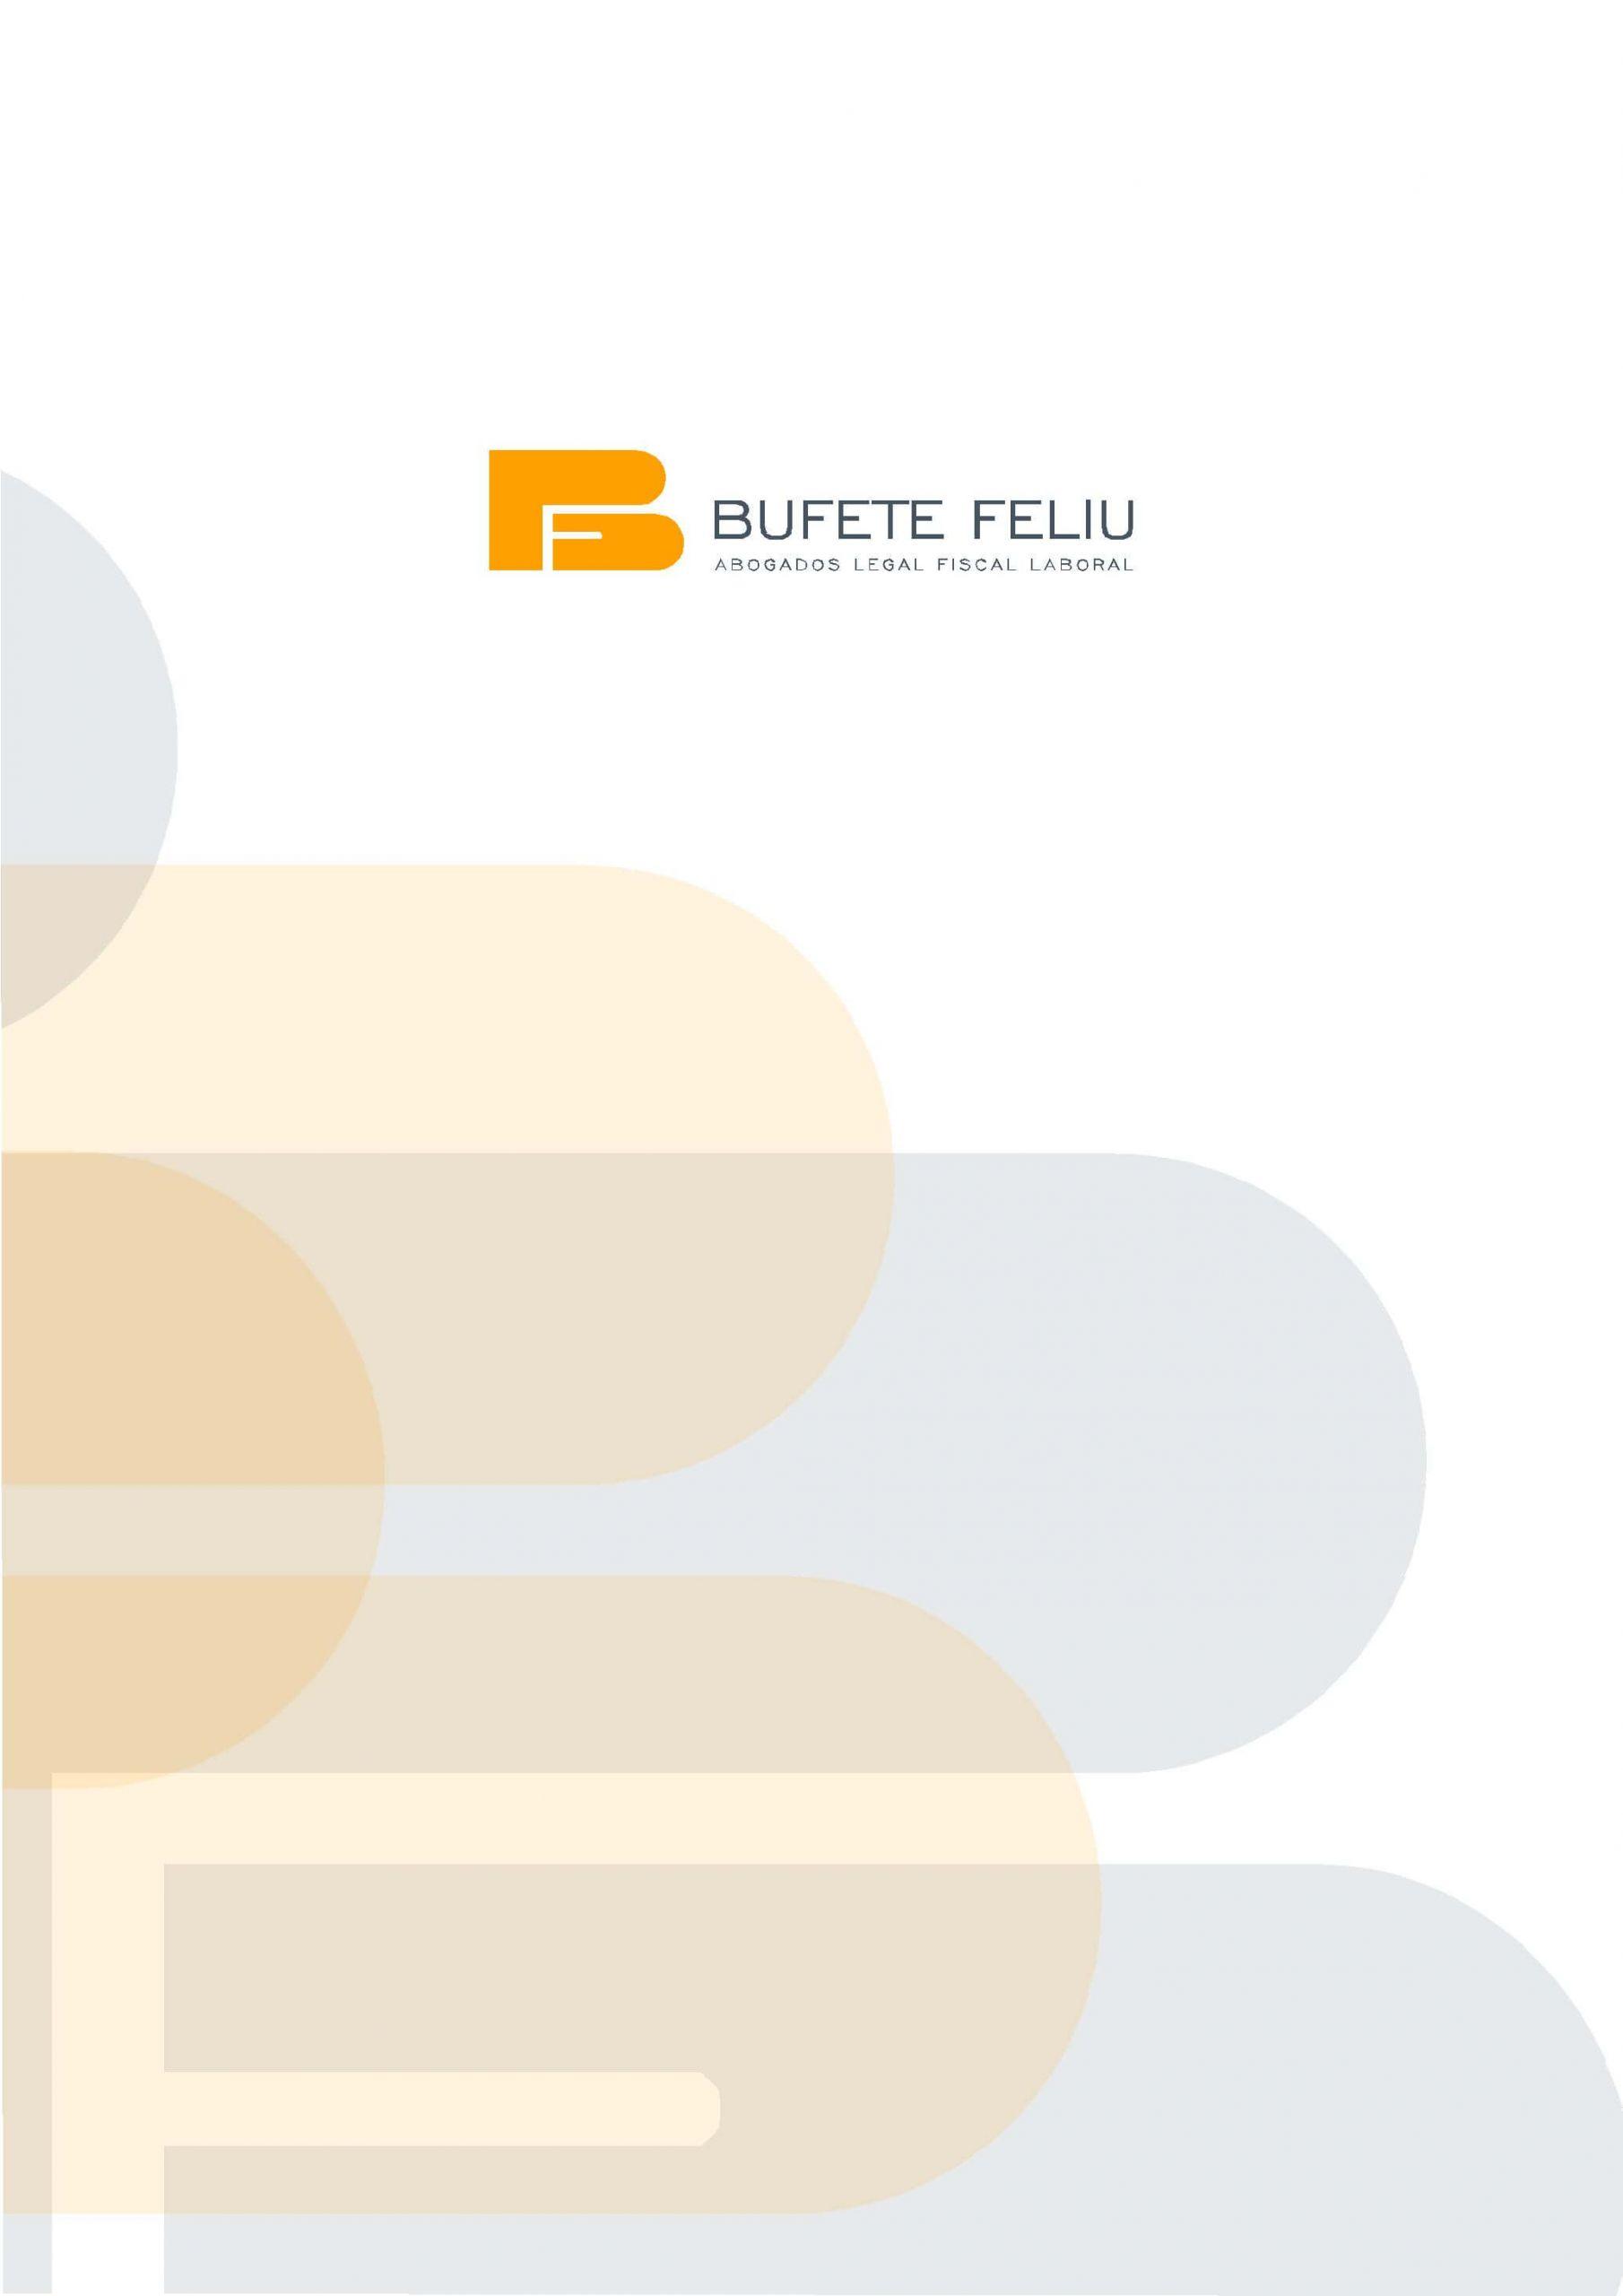 Diseño carpeta con solapa - Bufete Feliu